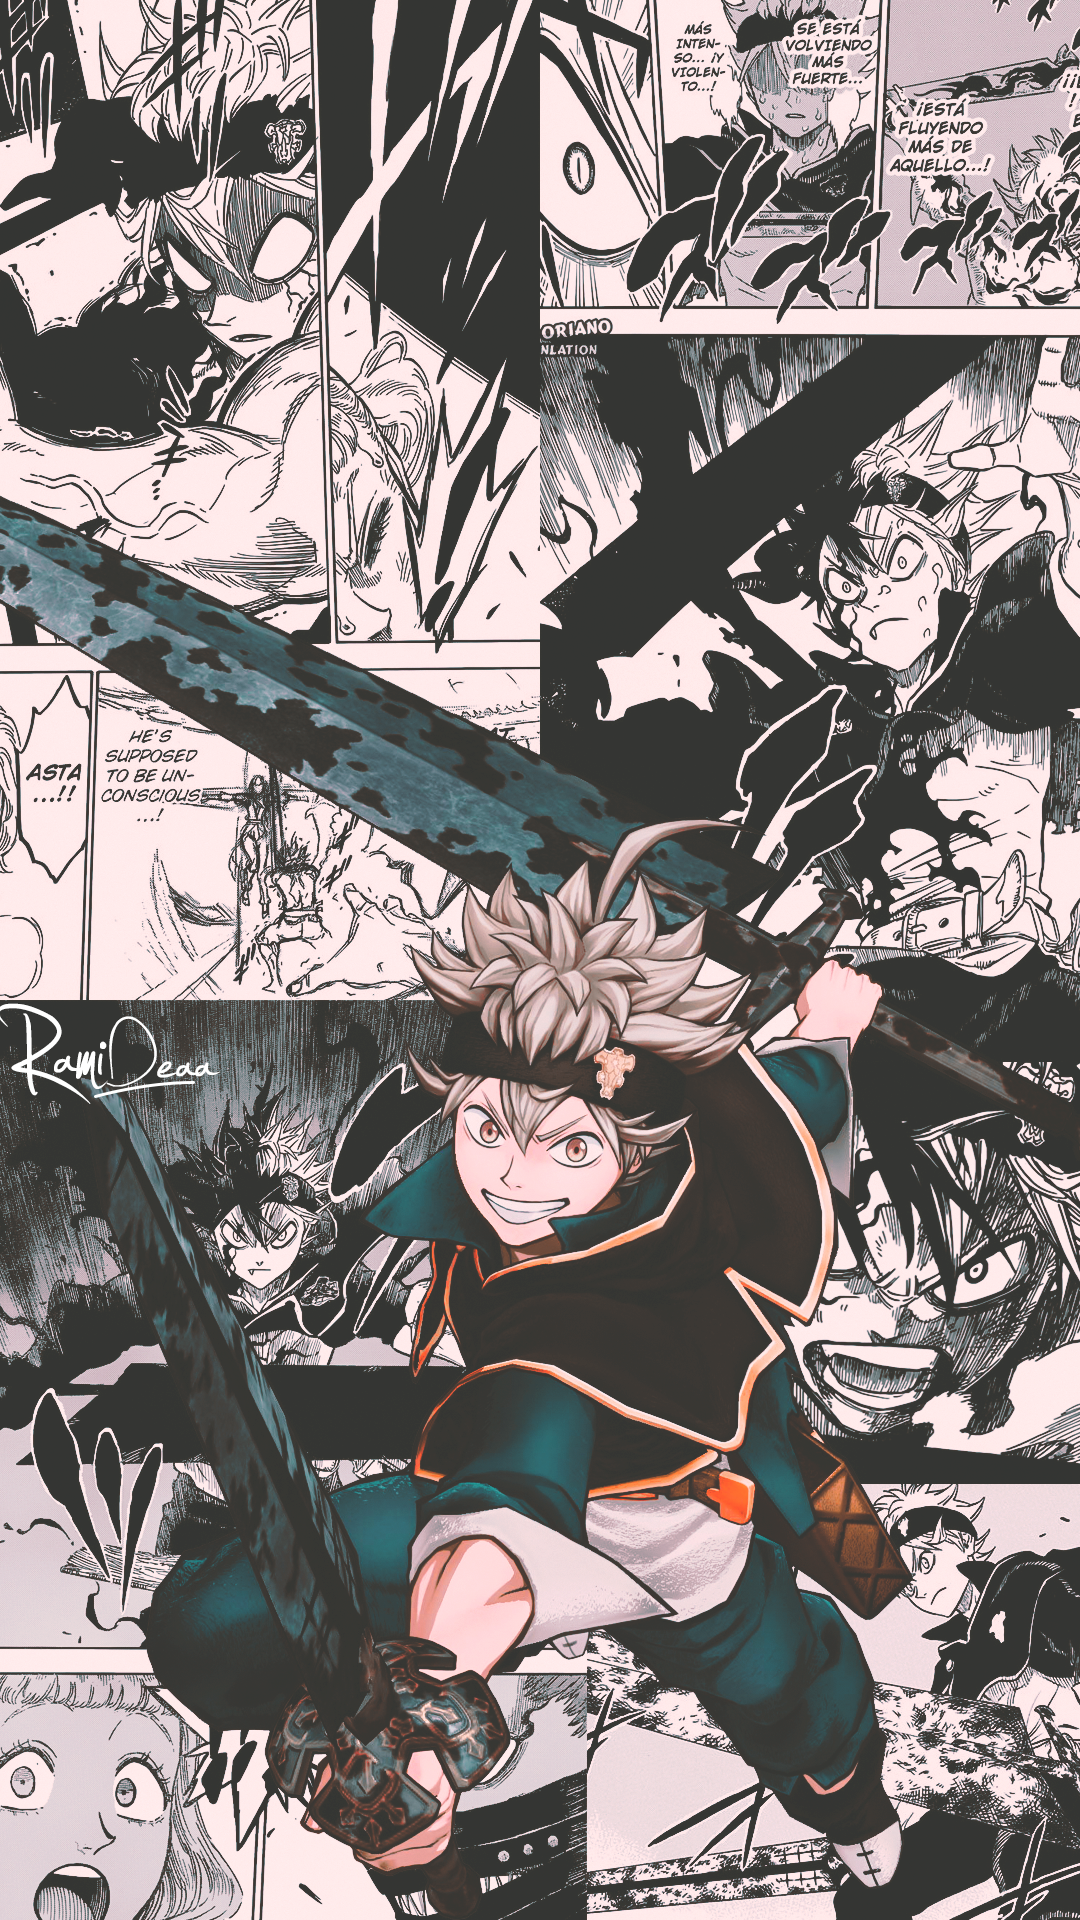 Aesthetic Anime Wallpapers Black - Anime Wallpaper HD